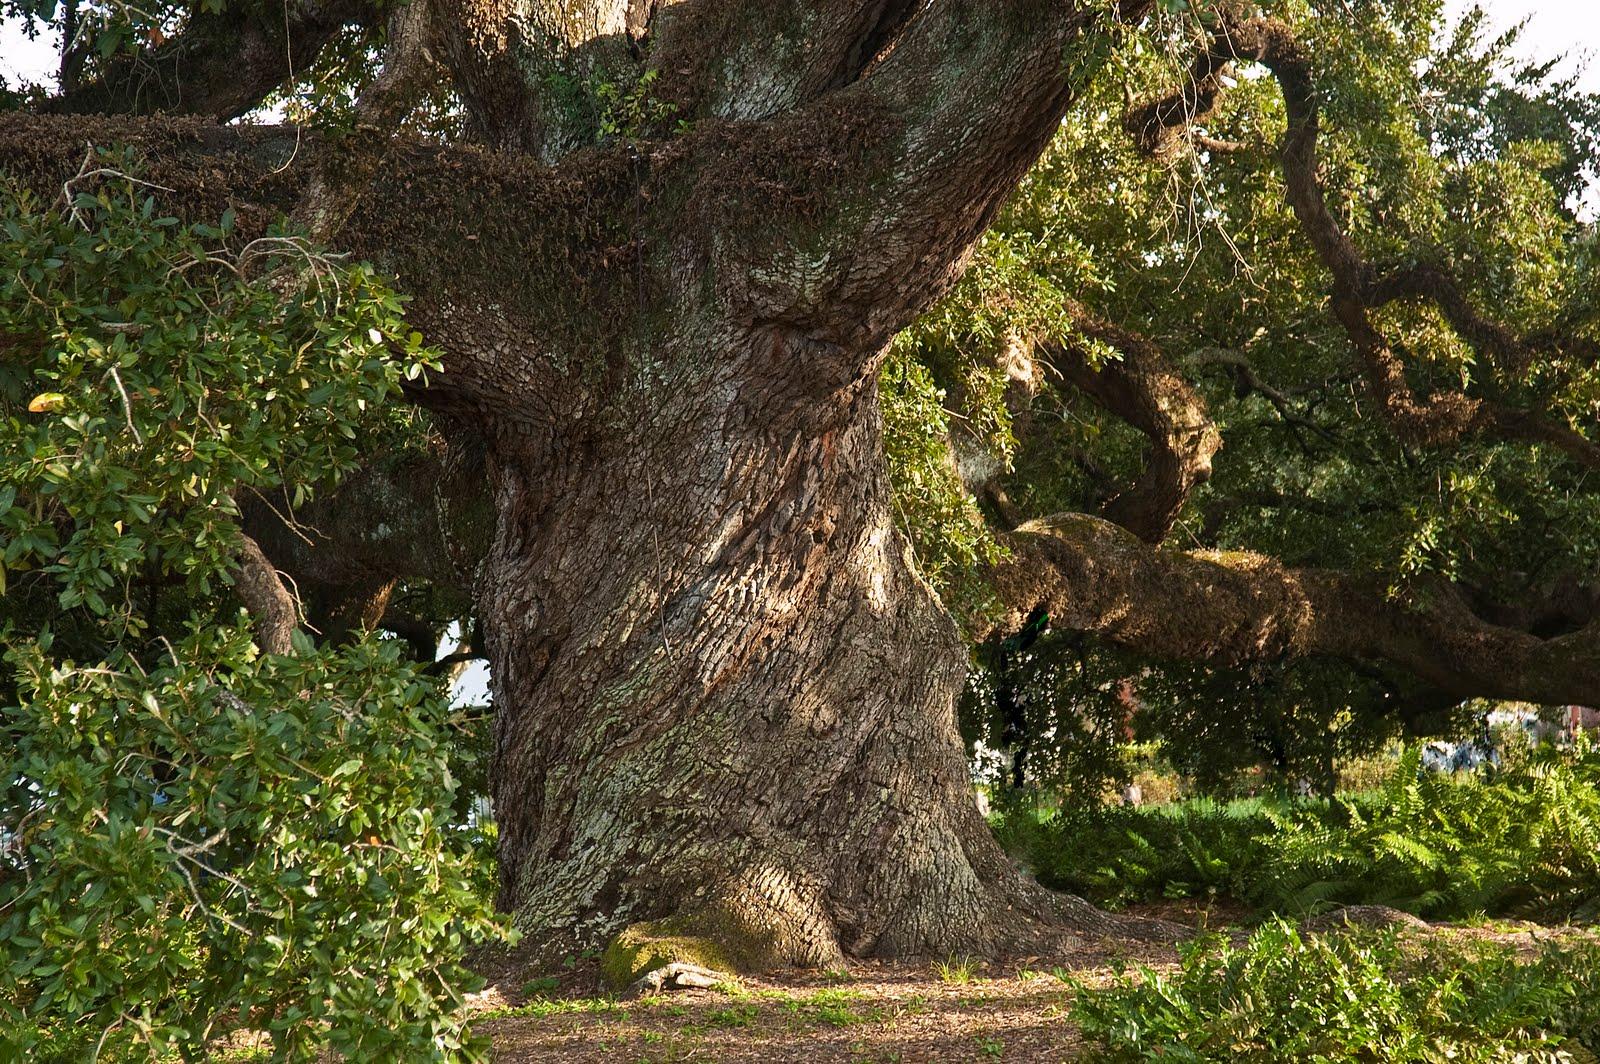 http://2.bp.blogspot.com/_o3ugtXzjSsc/SwgDAKziXgI/AAAAAAAABE8/voqzpLnD-Gc/s1600/St_John%27s_Cathederal_Oak_Tree.jpg